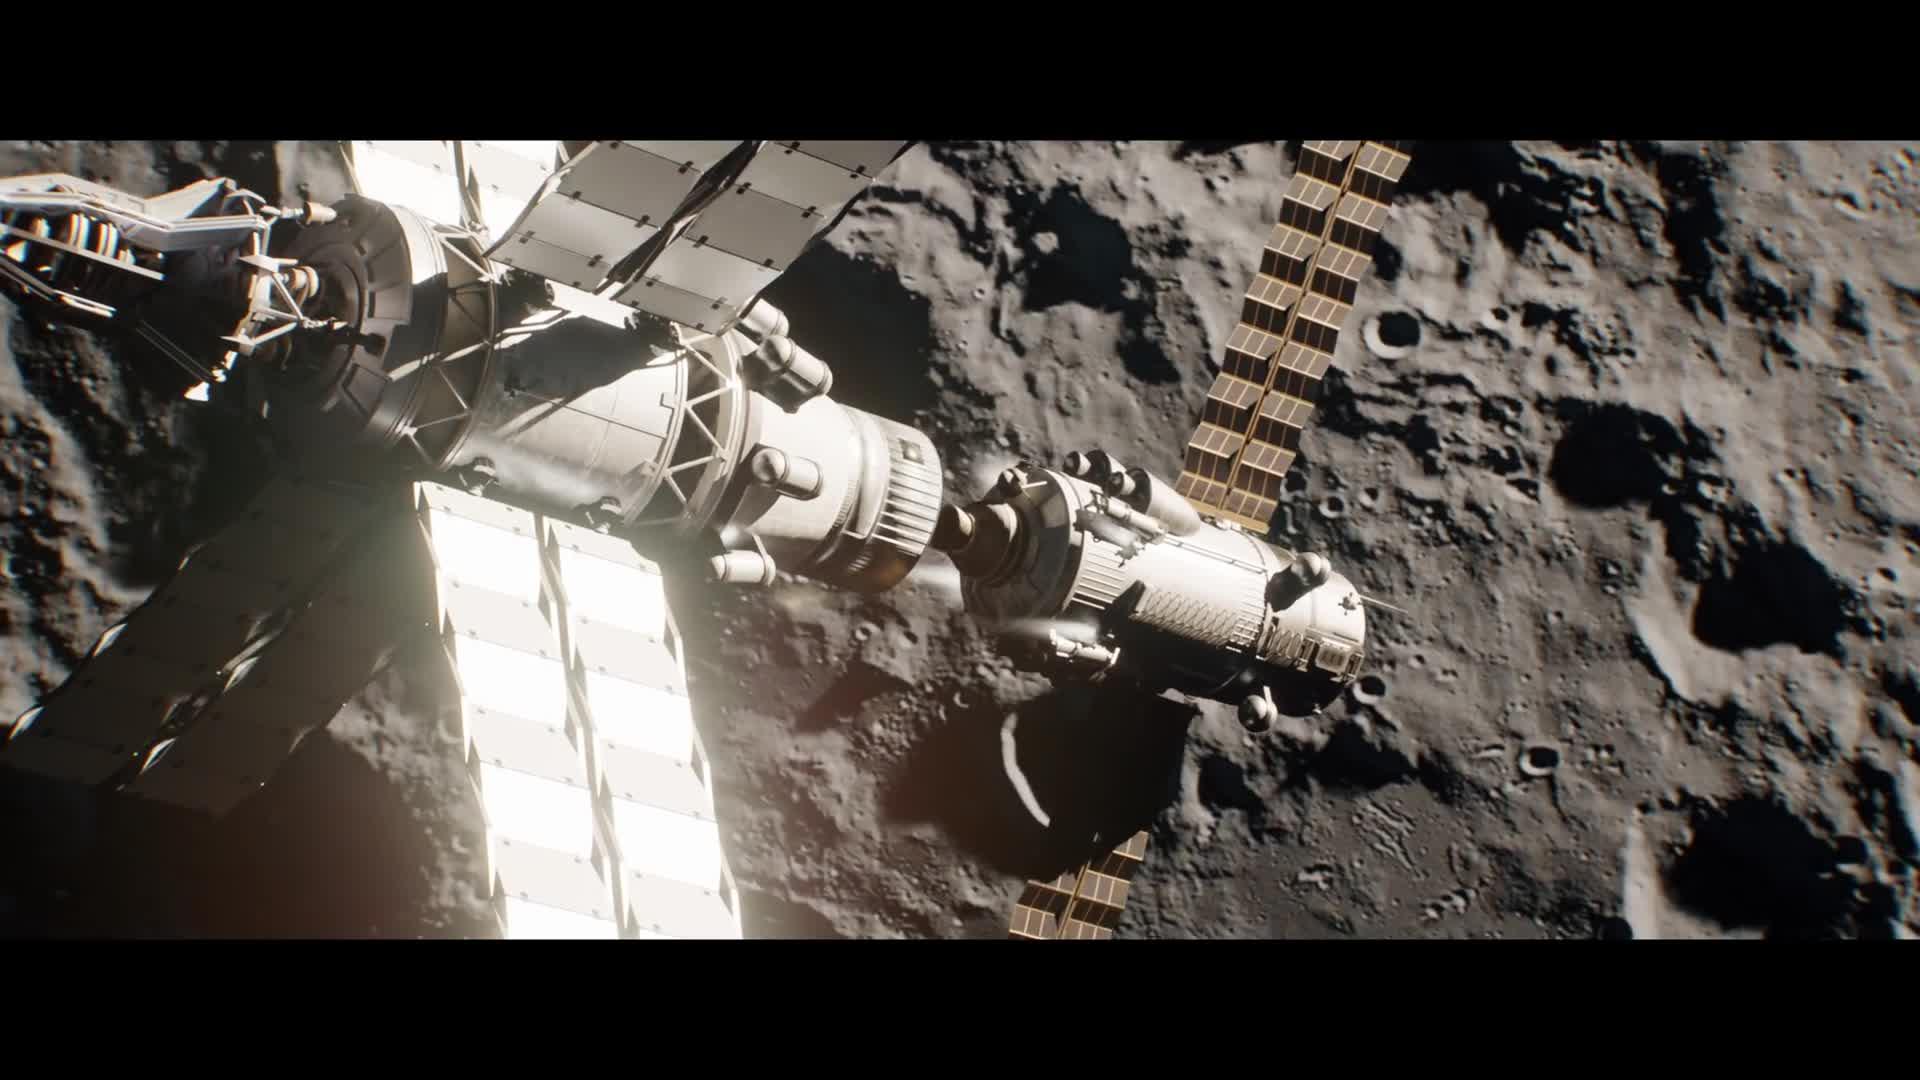 Kerbal Space Program 2 - Cinematic Announce Trailer [HD] screen capture